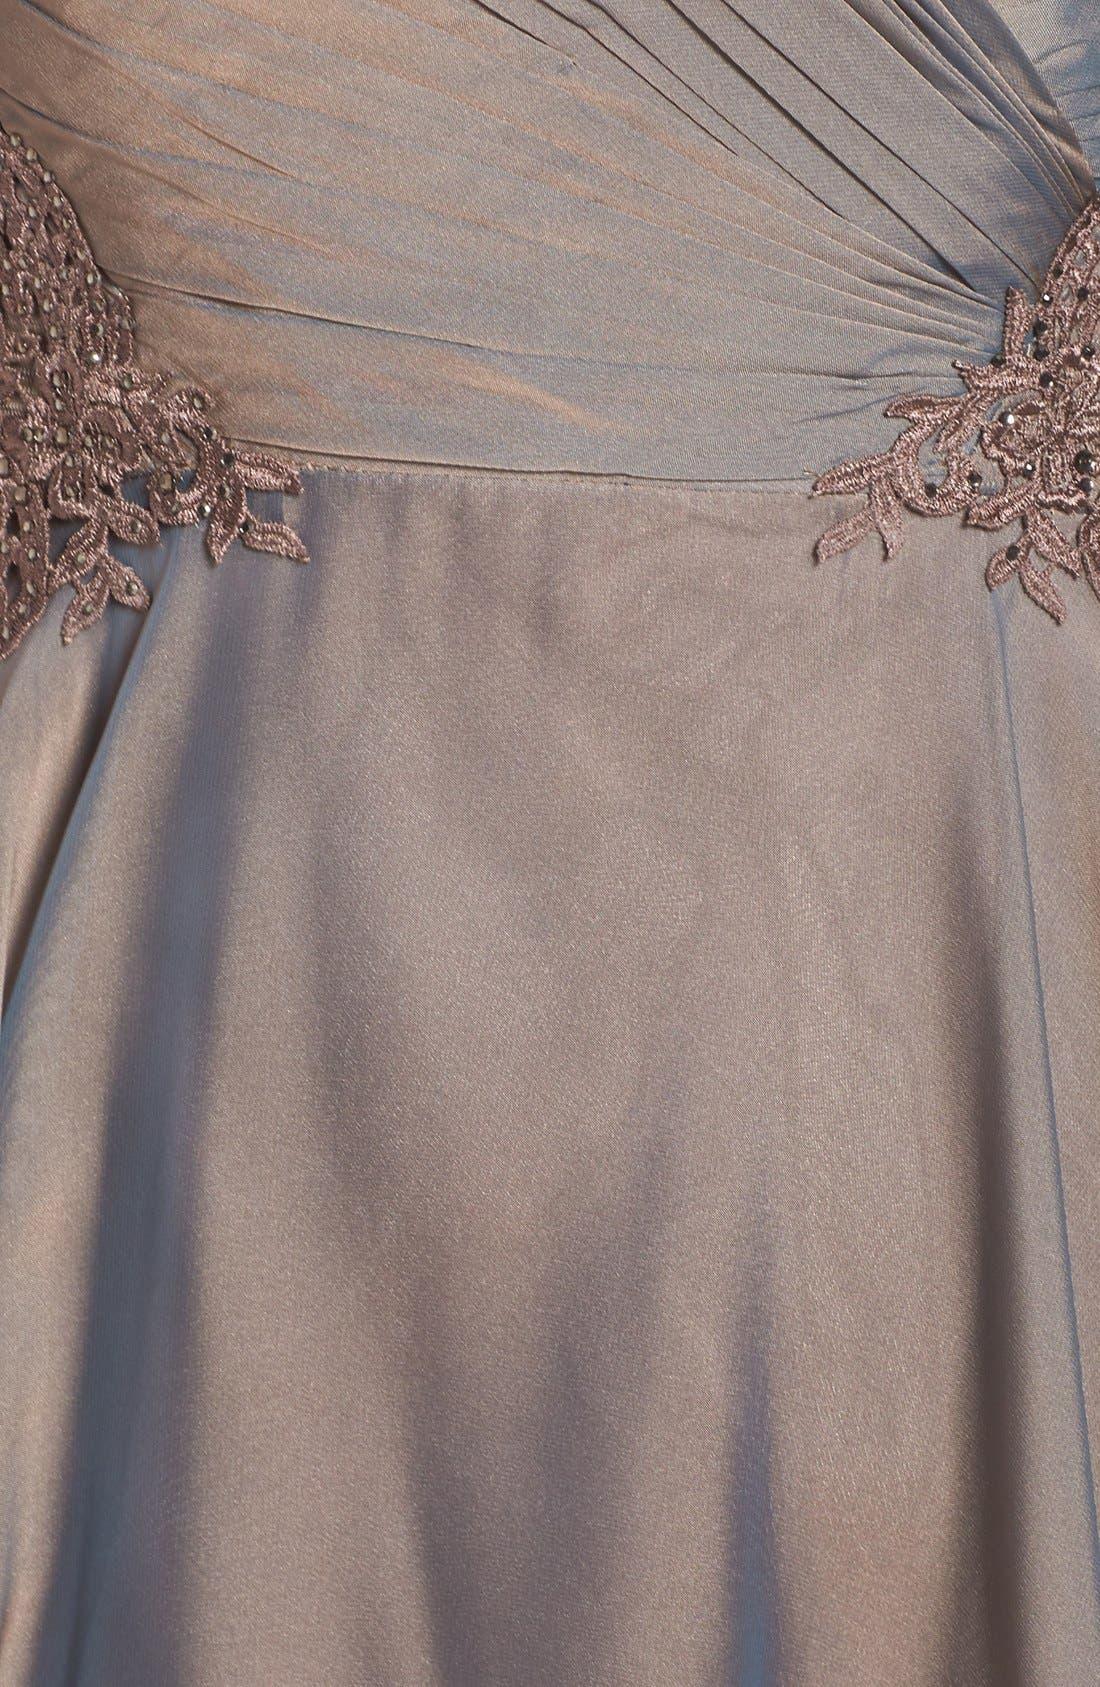 LA FEMME, Ruched Chiffon Gown, Alternate thumbnail 5, color, COCOA